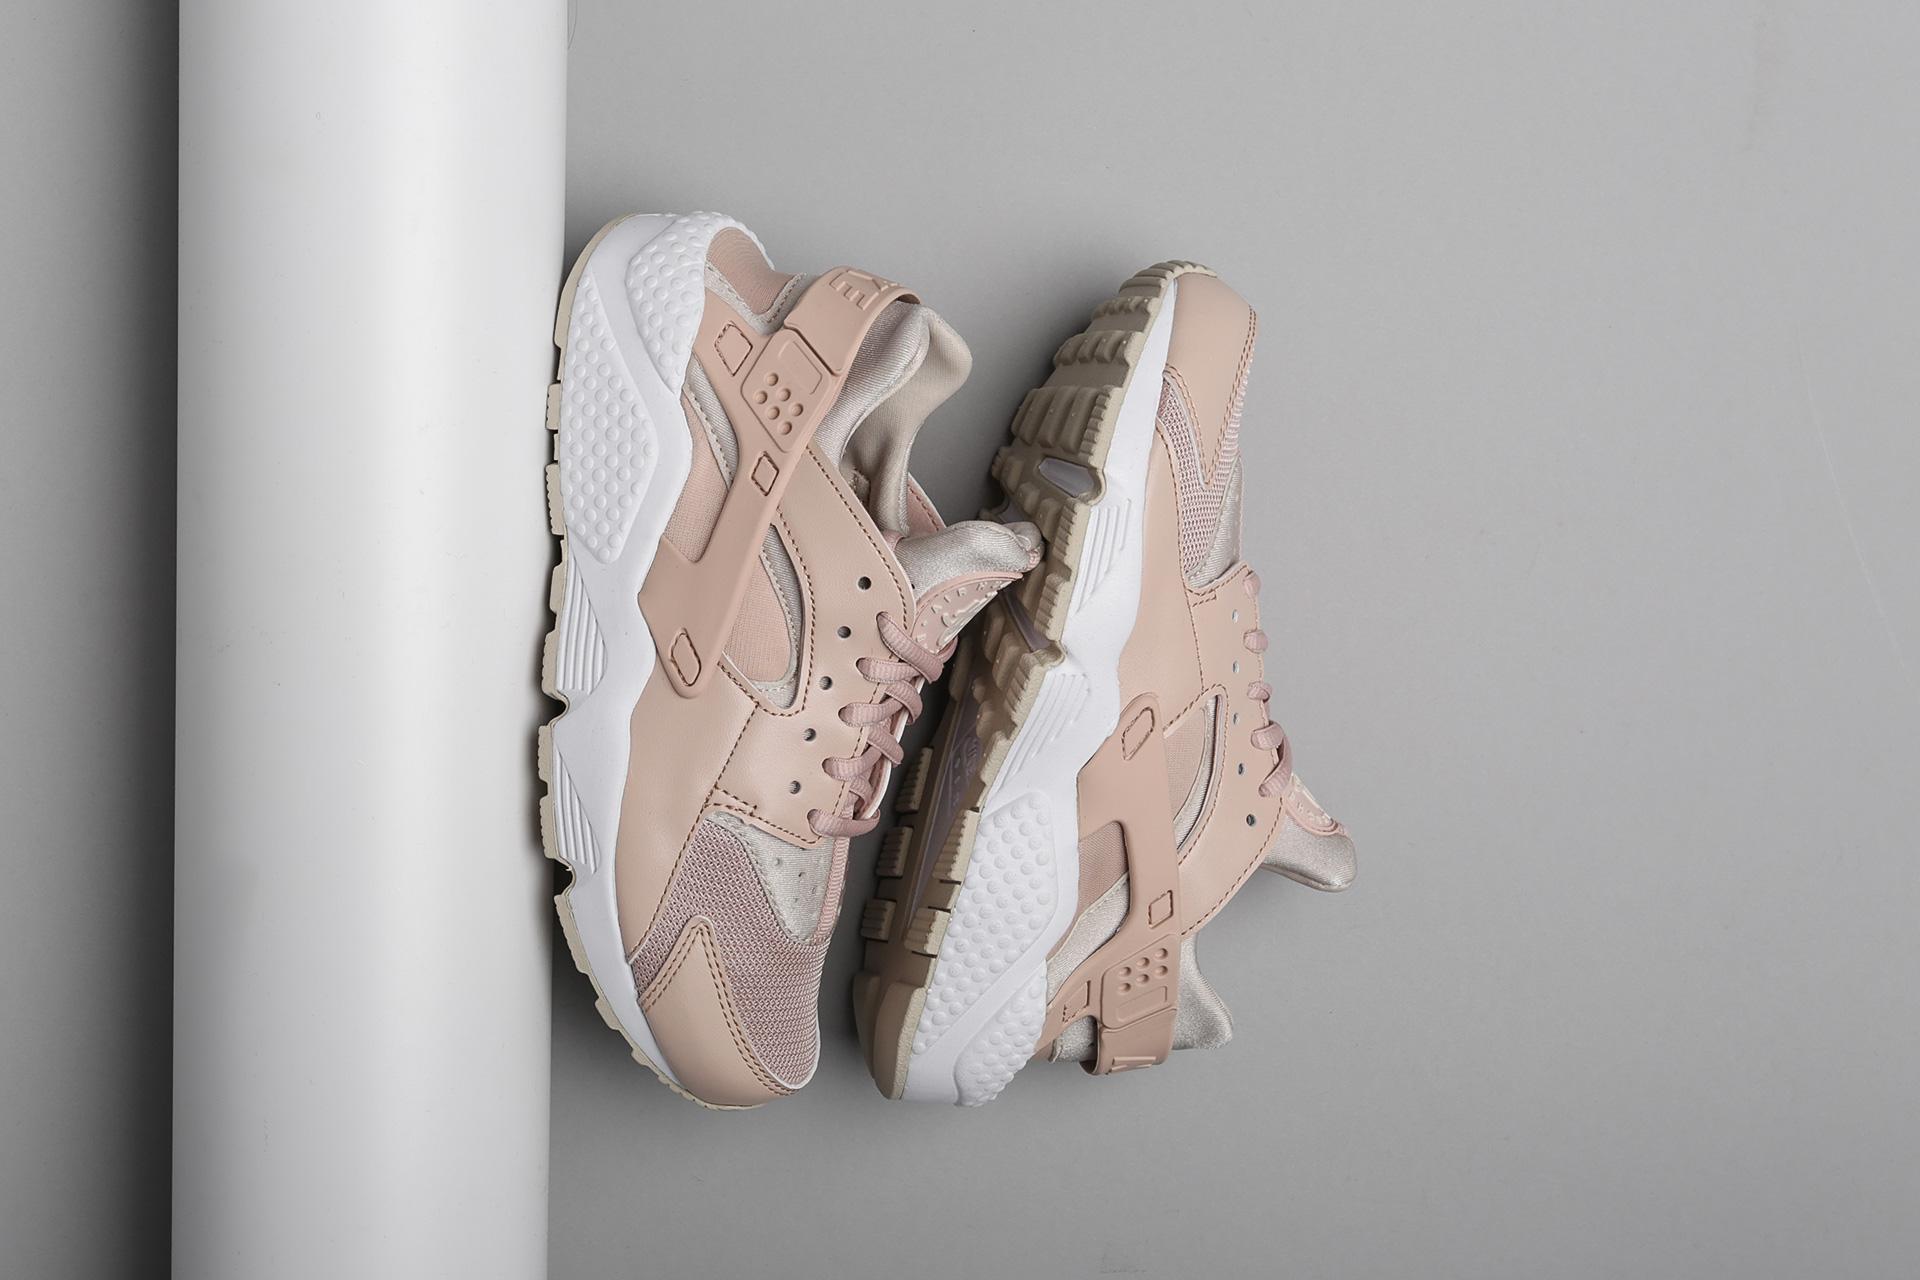 on sale 6fc0b 9ed66 Купить женские бежевые кроссовки Nike WMNS Air Huarache Run